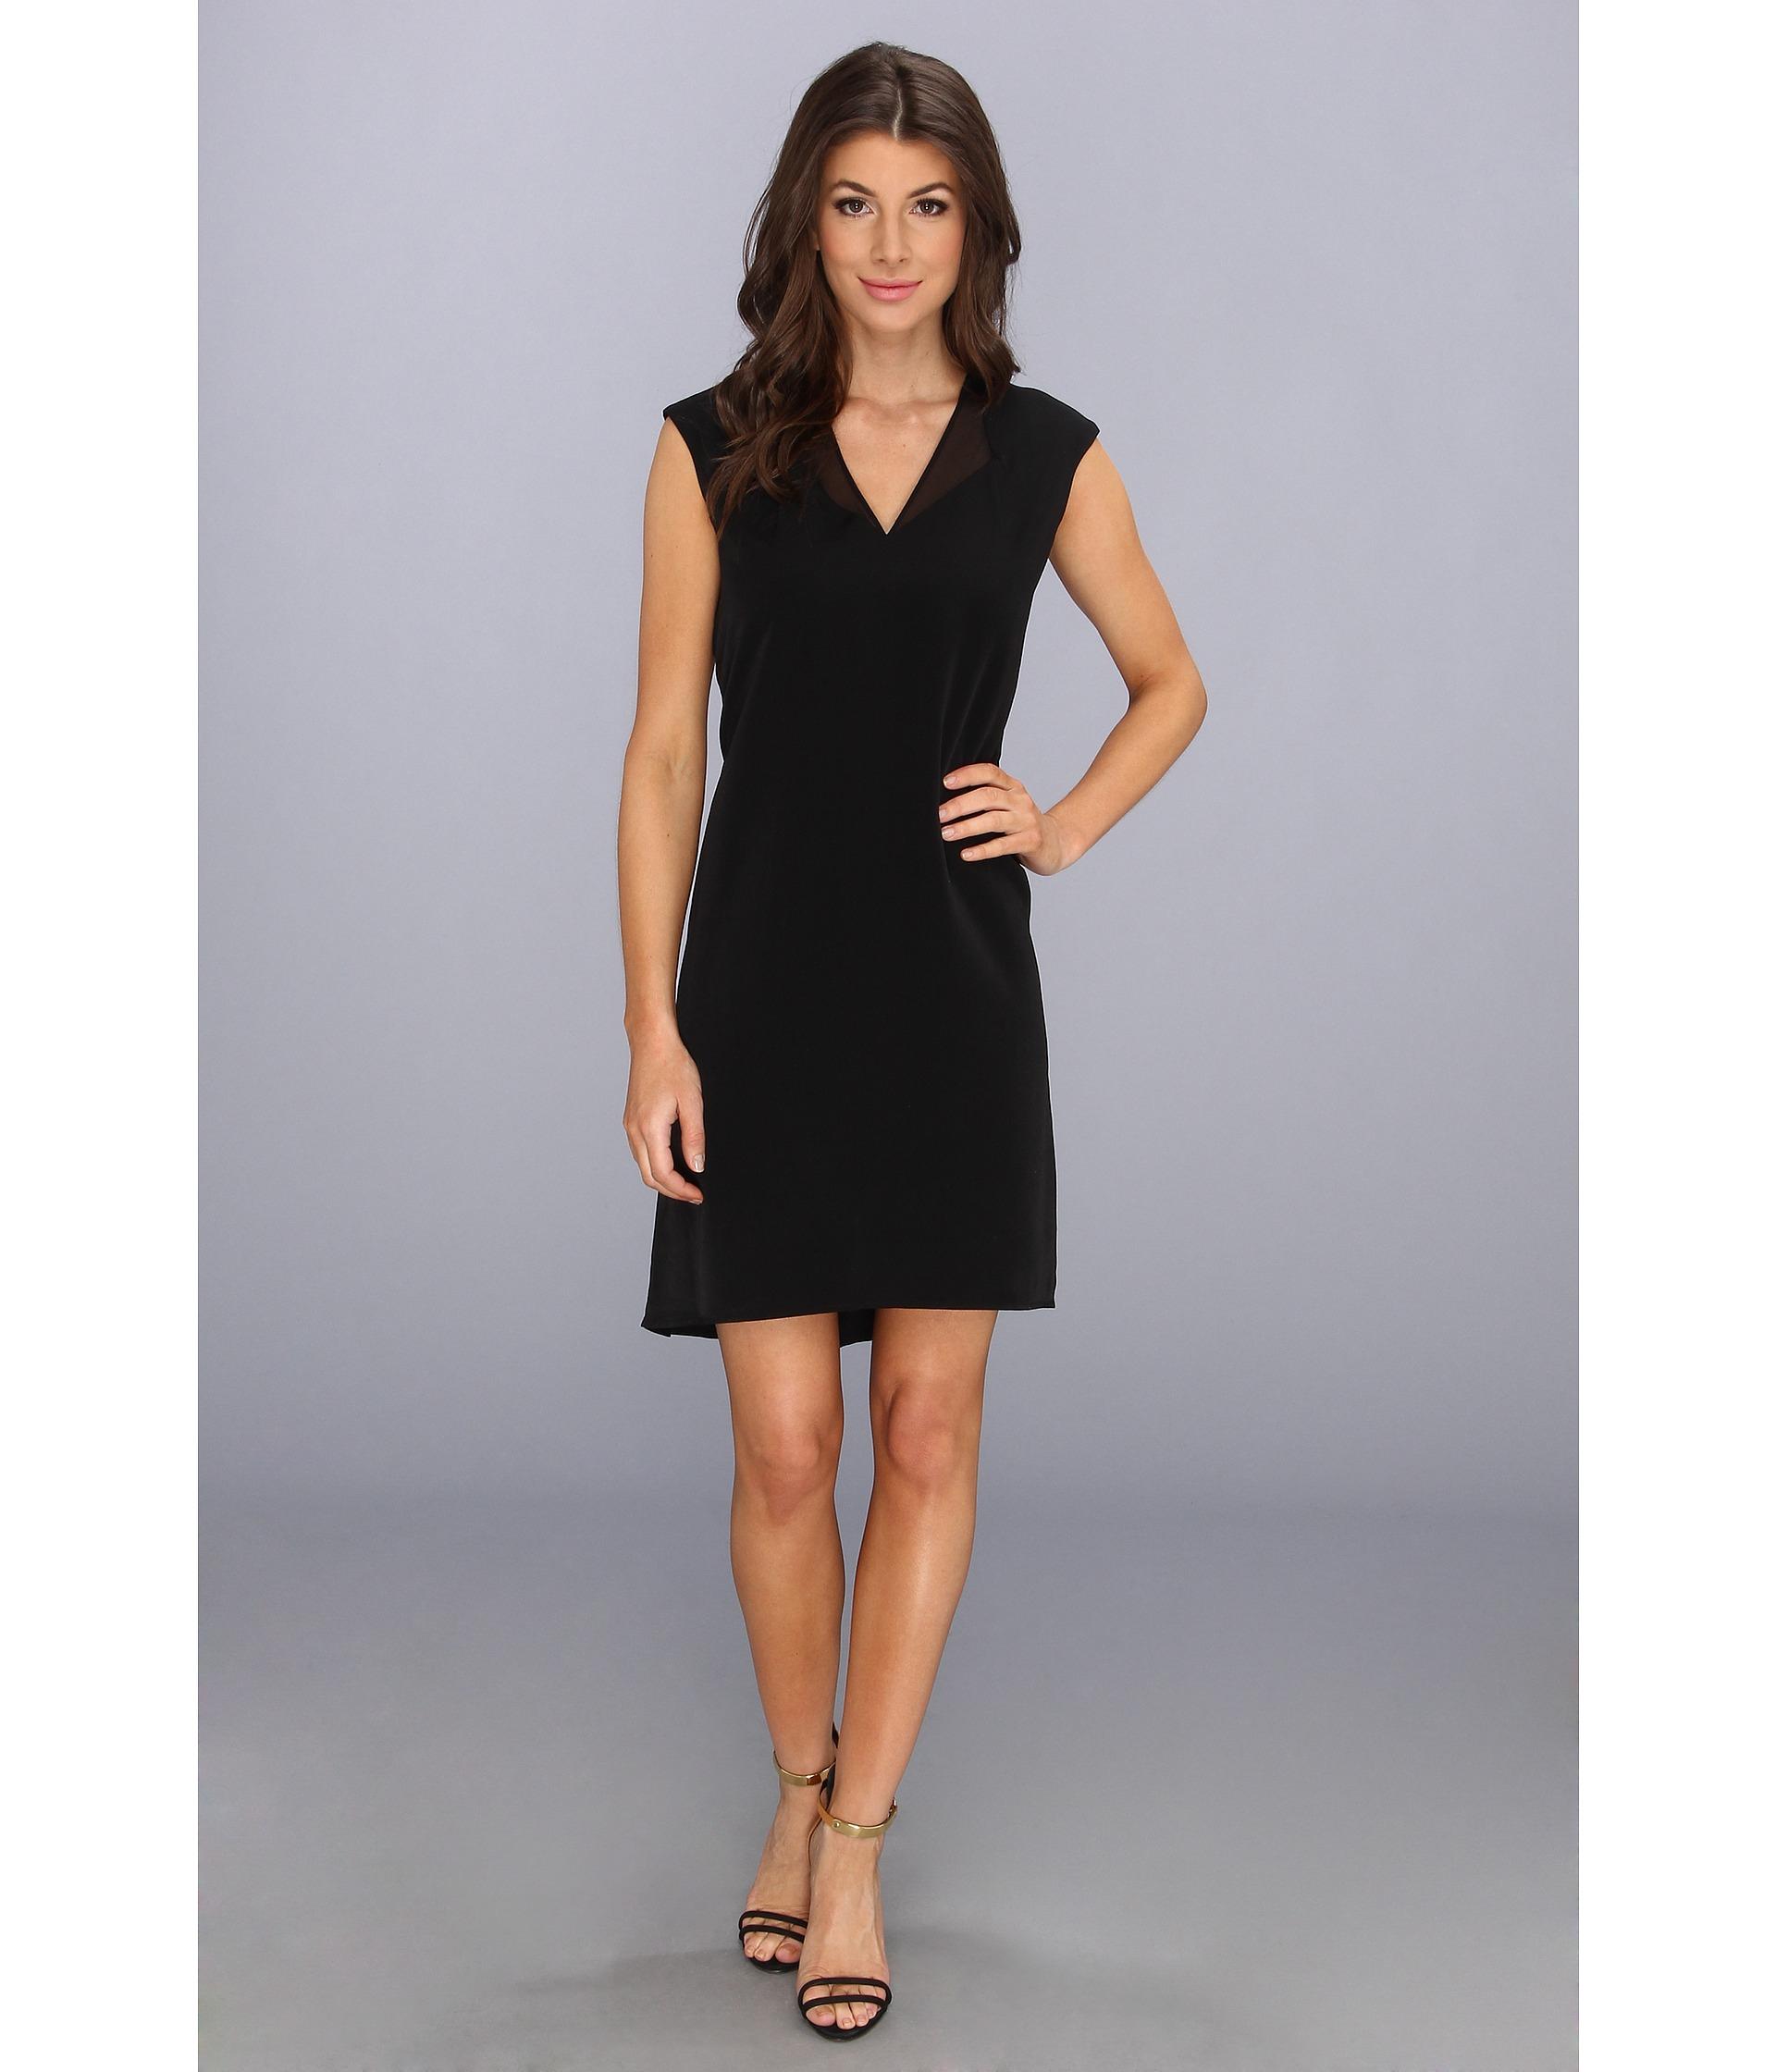 65bcc6103ea39 Lyst - Calvin Klein Vneck 4 Ply Dress W Chiffon in Black